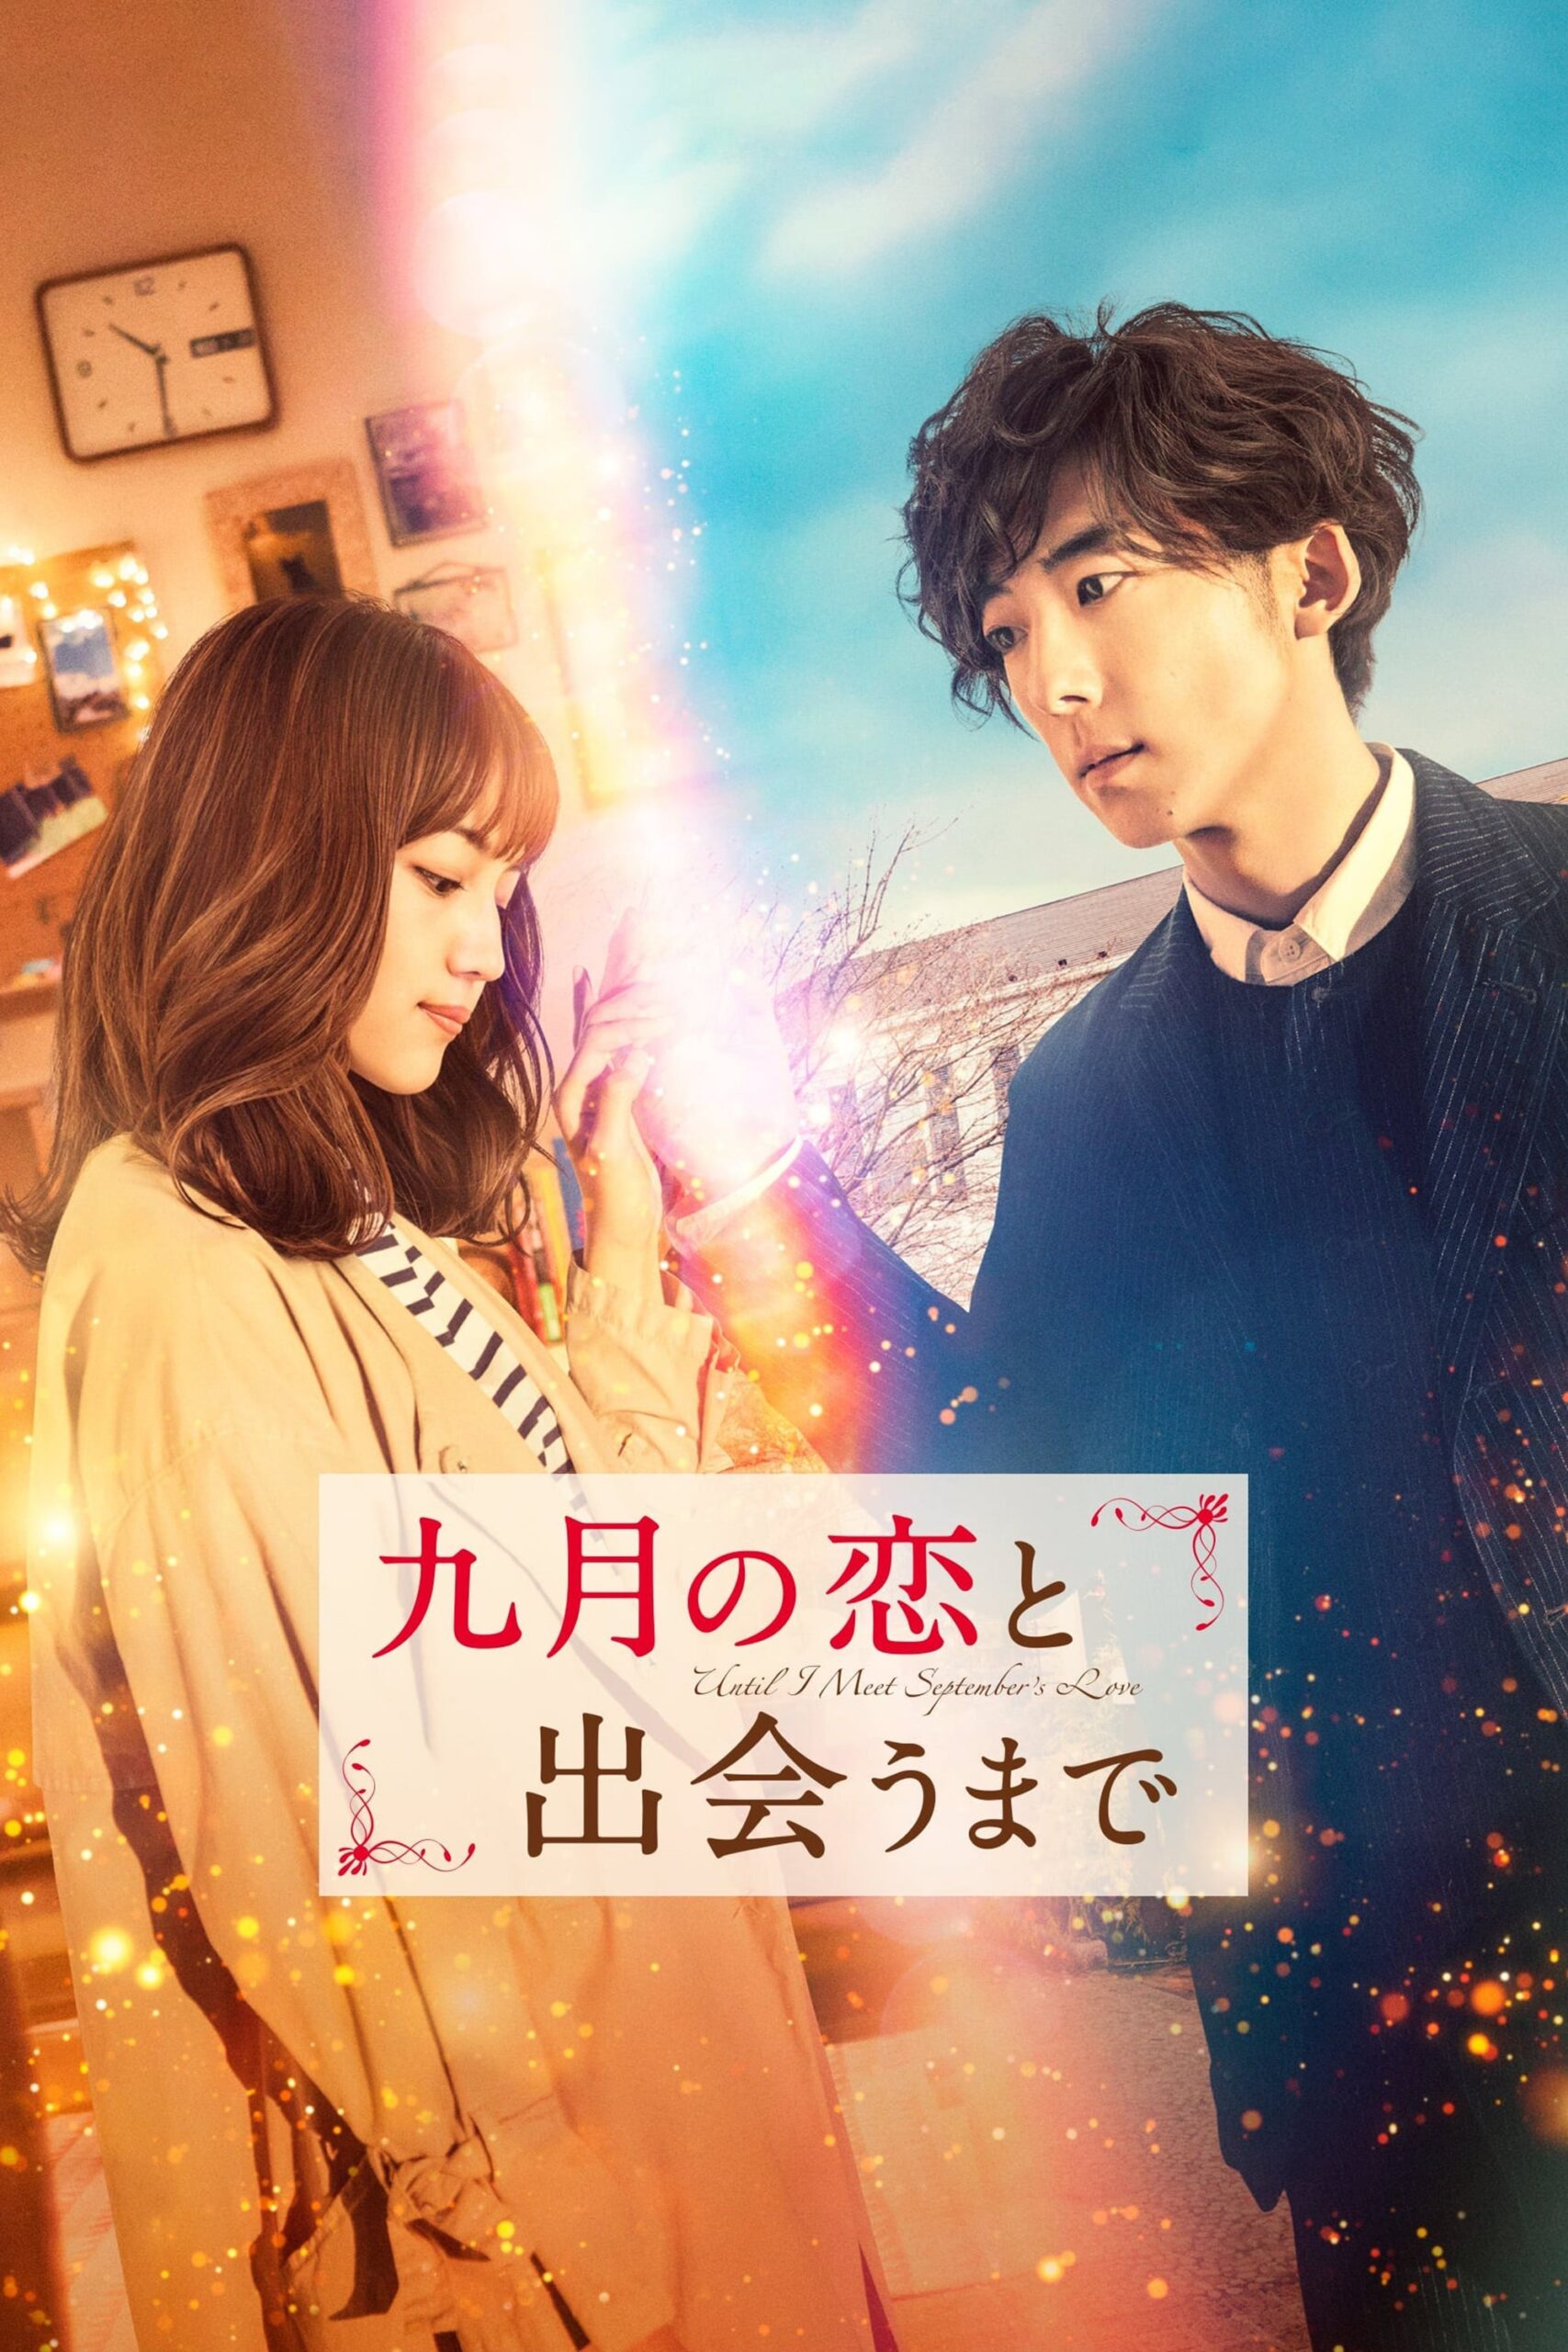 Until I Meet September's Love Movie Streaming Online